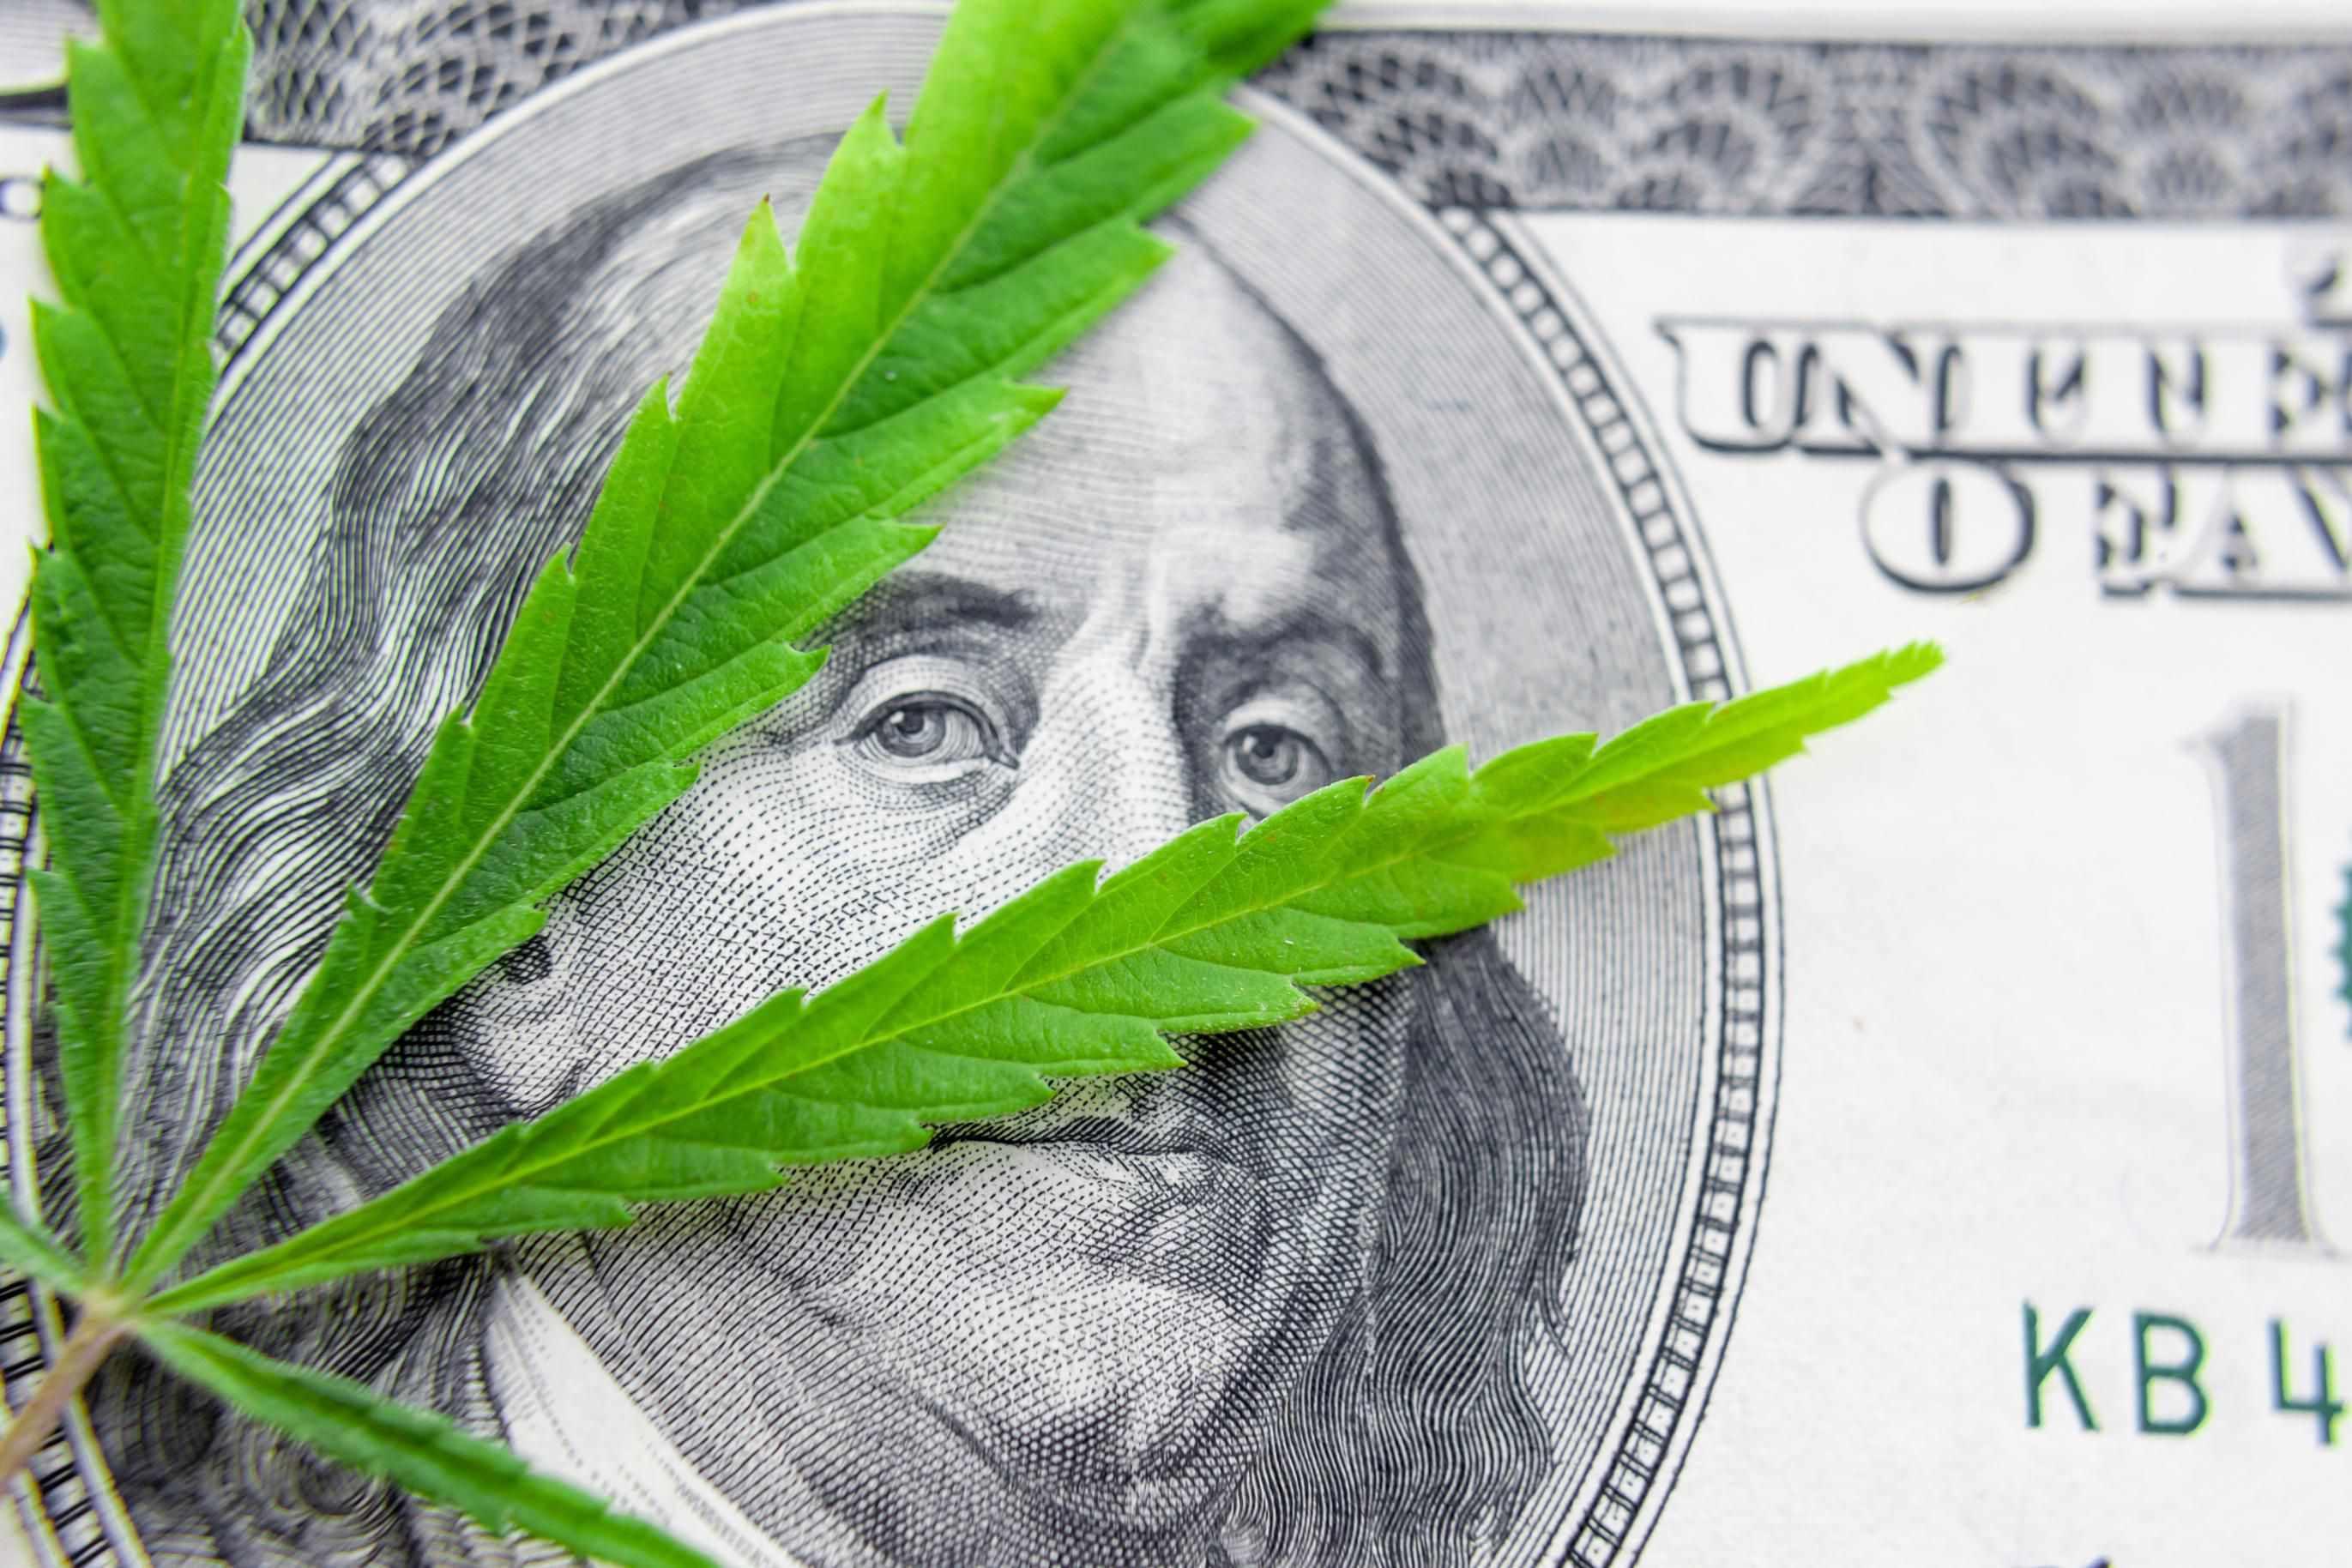 state market legalizes pot squash